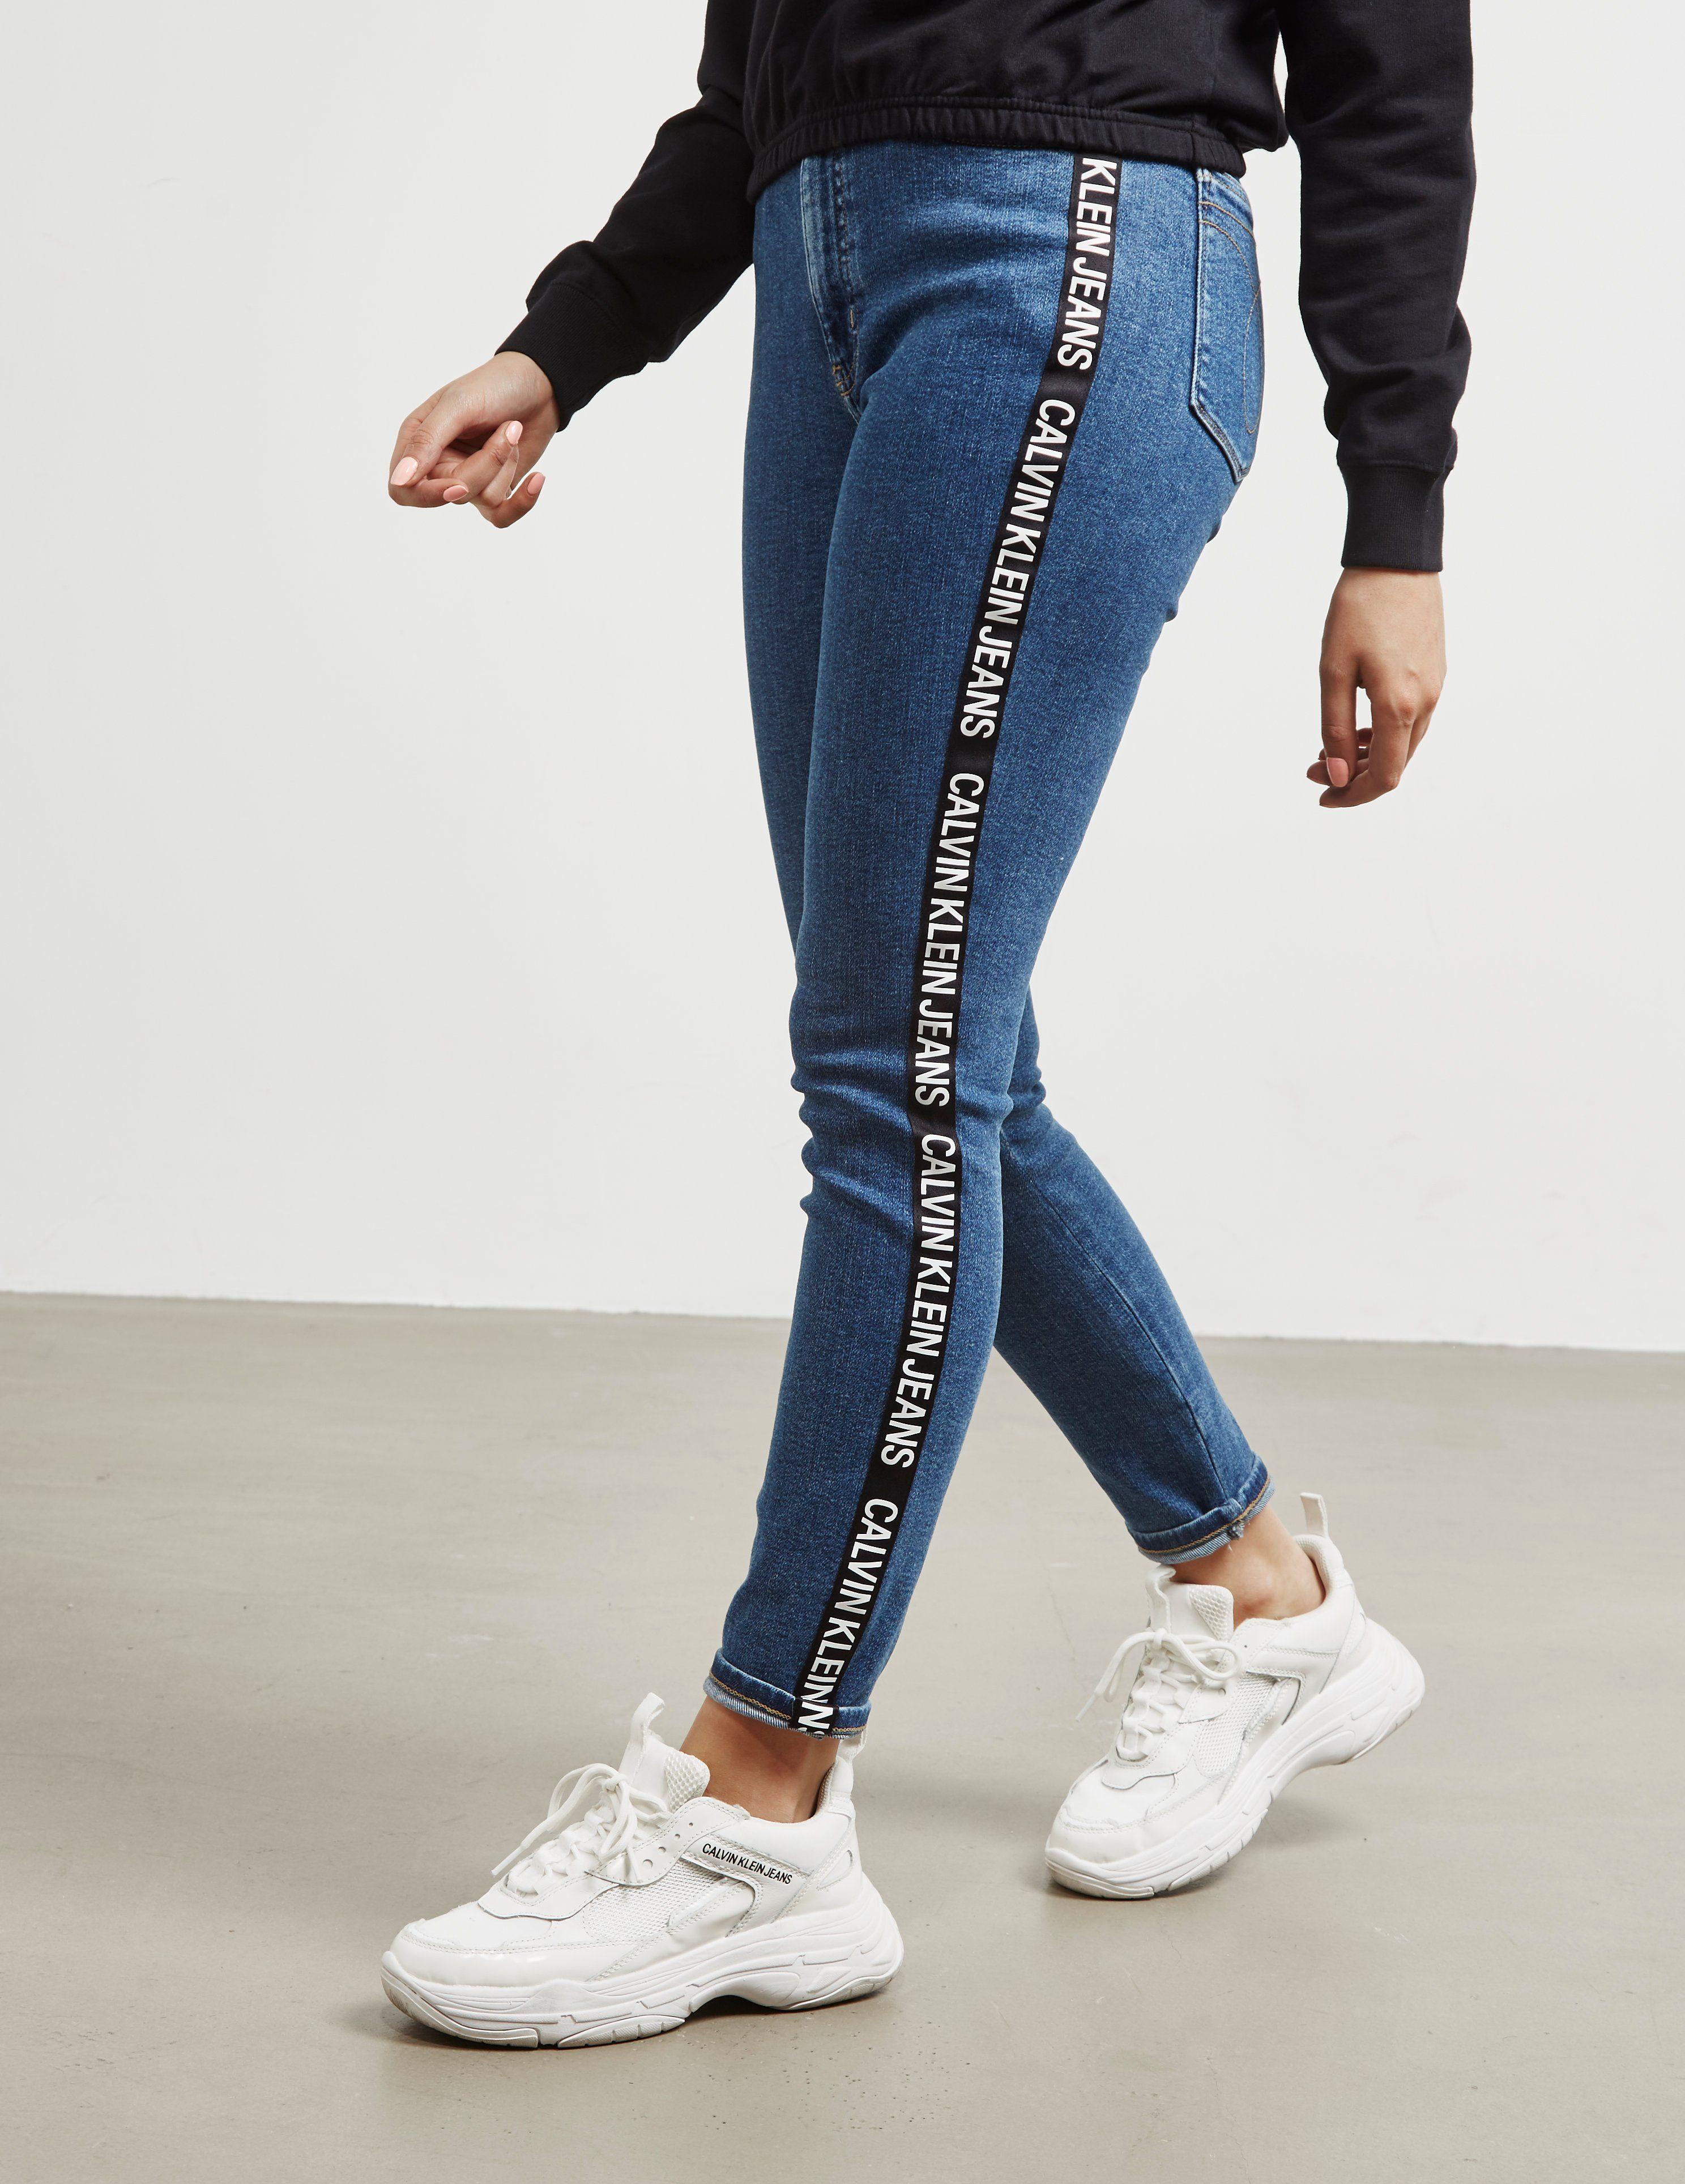 Calvin Klein Jeans 010 Tape Jeans